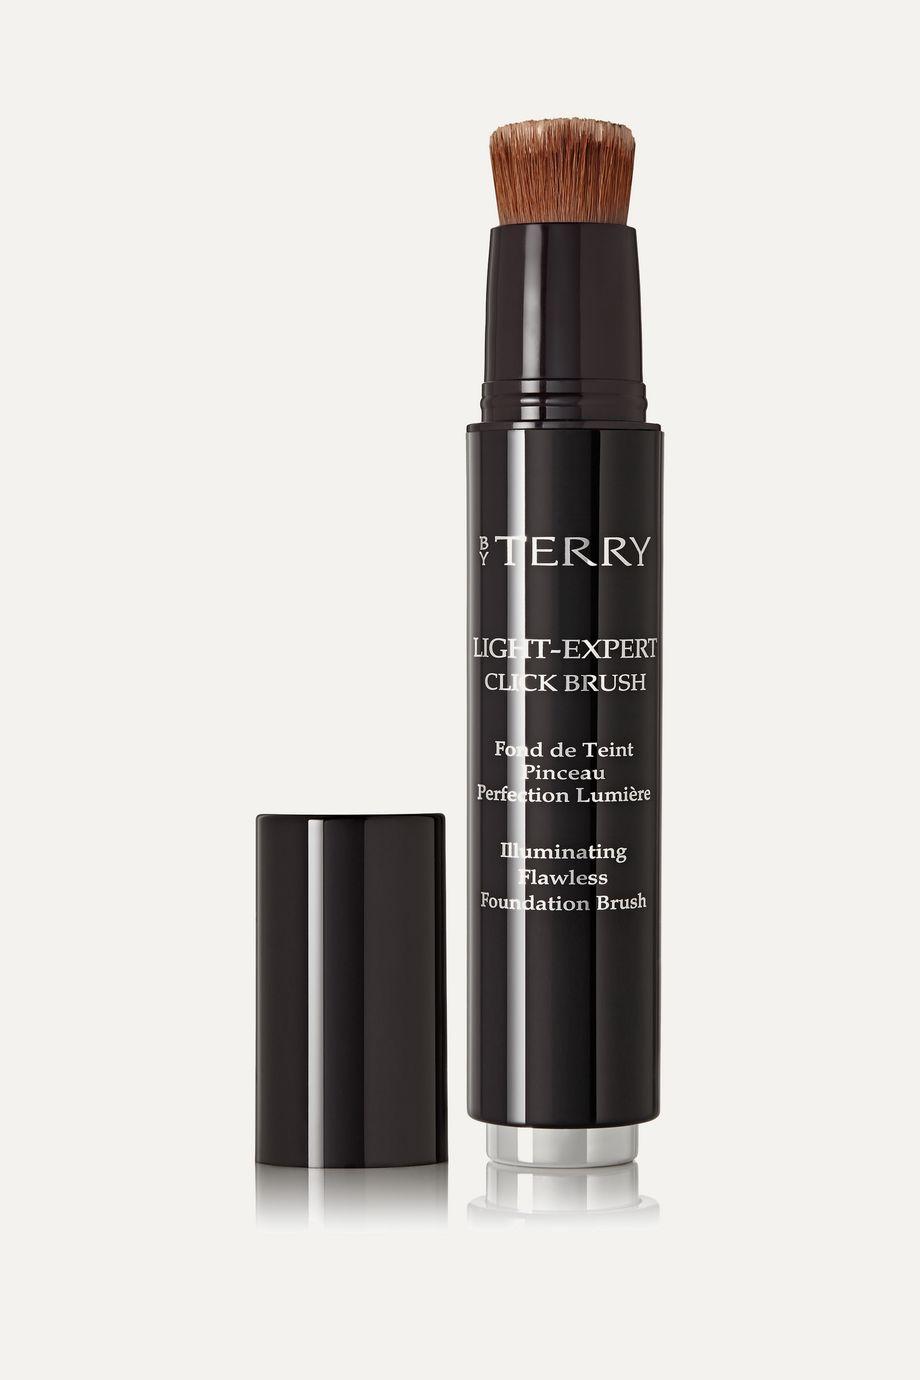 BY TERRY Fond de Teint Pinceau Perfection Lumière, Apricot Light 2, 19,5 ml